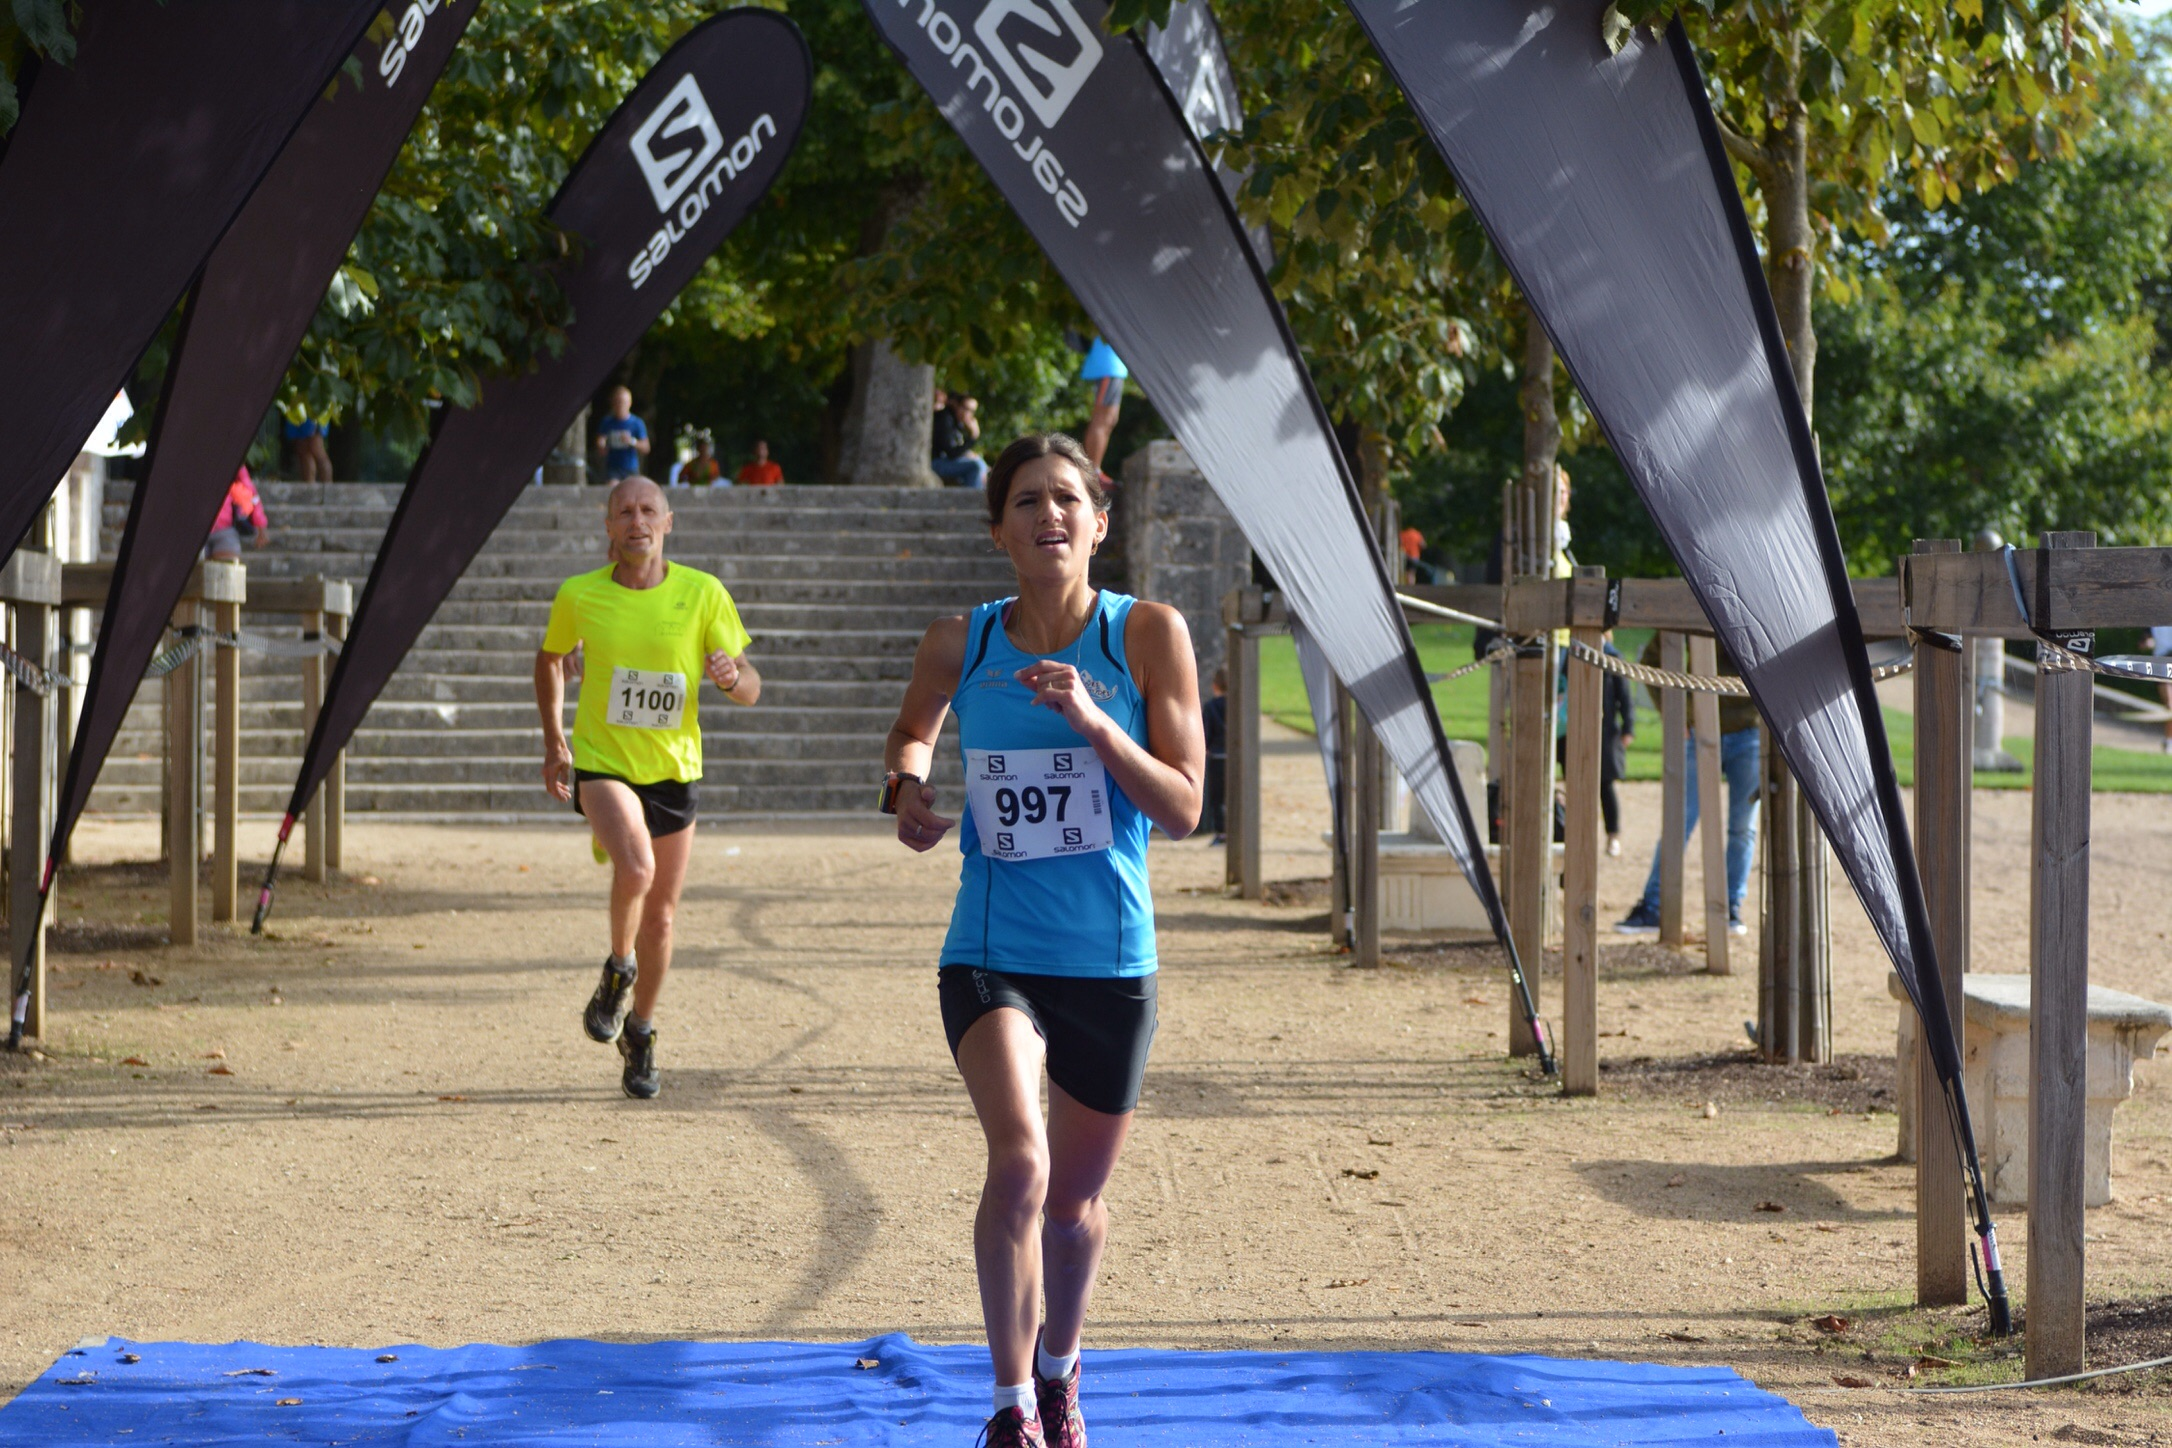 06-09-15 – Urban trail de Blois